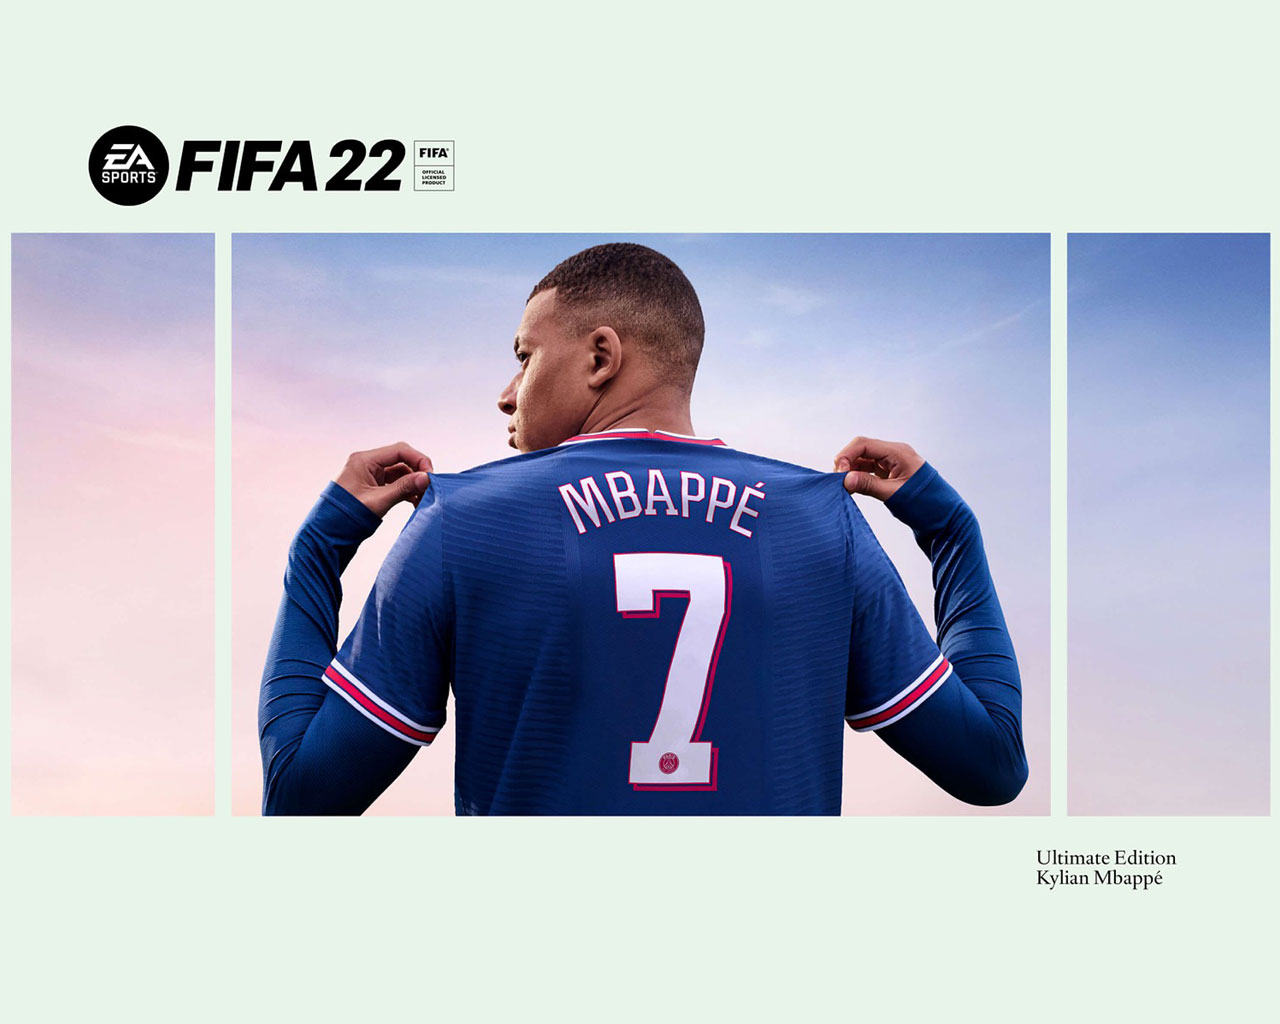 Free FIFA 22 Wallpaper in 1280x1024